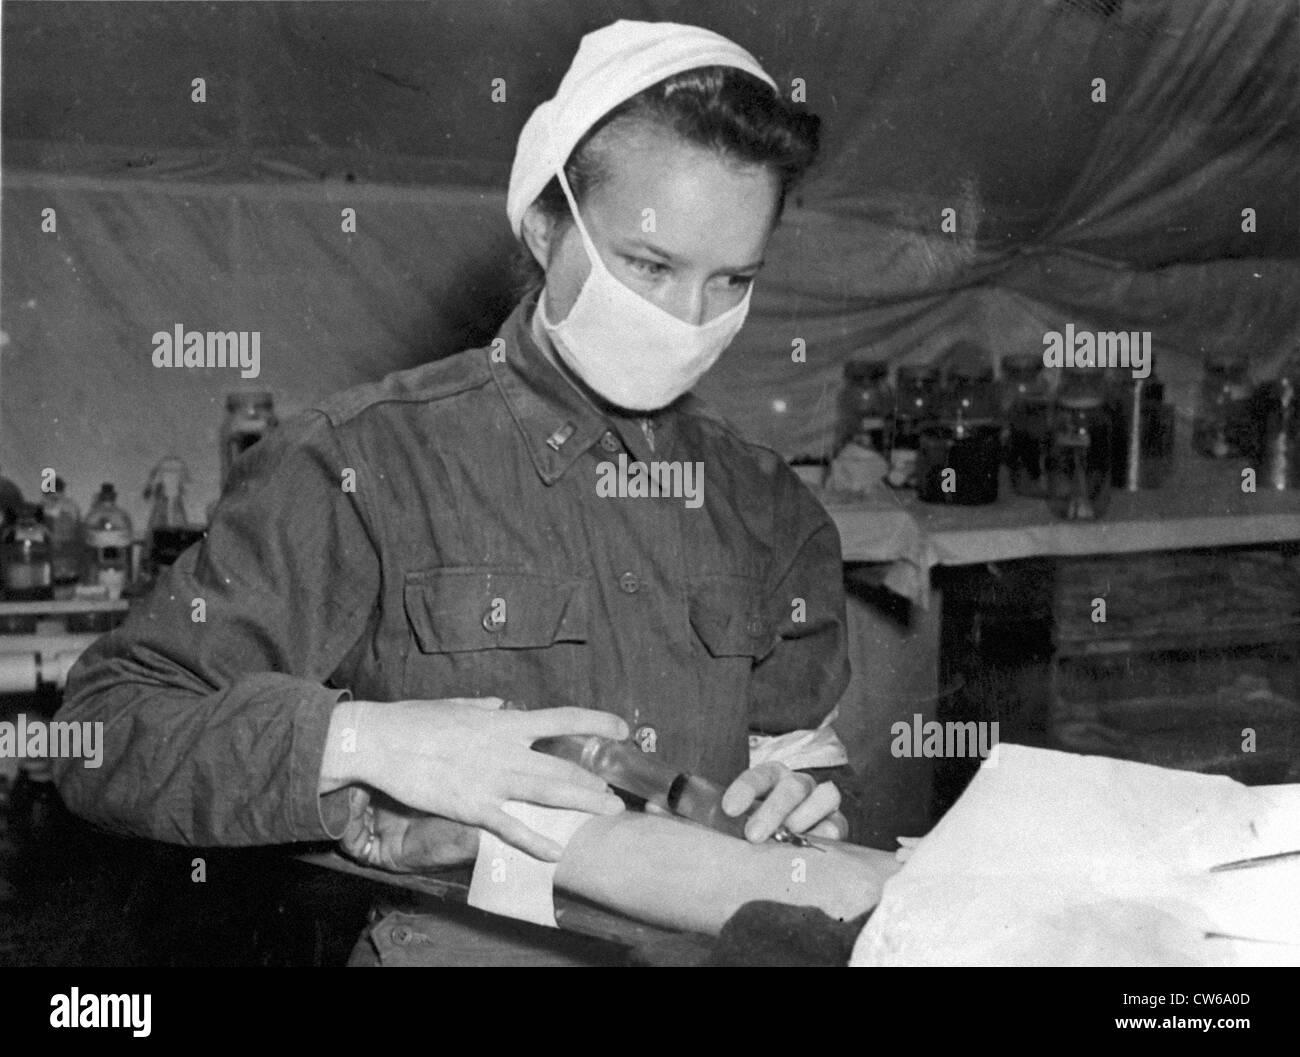 Battlefront nurse somewhere in Normandy (Summer 1944) - Stock Image